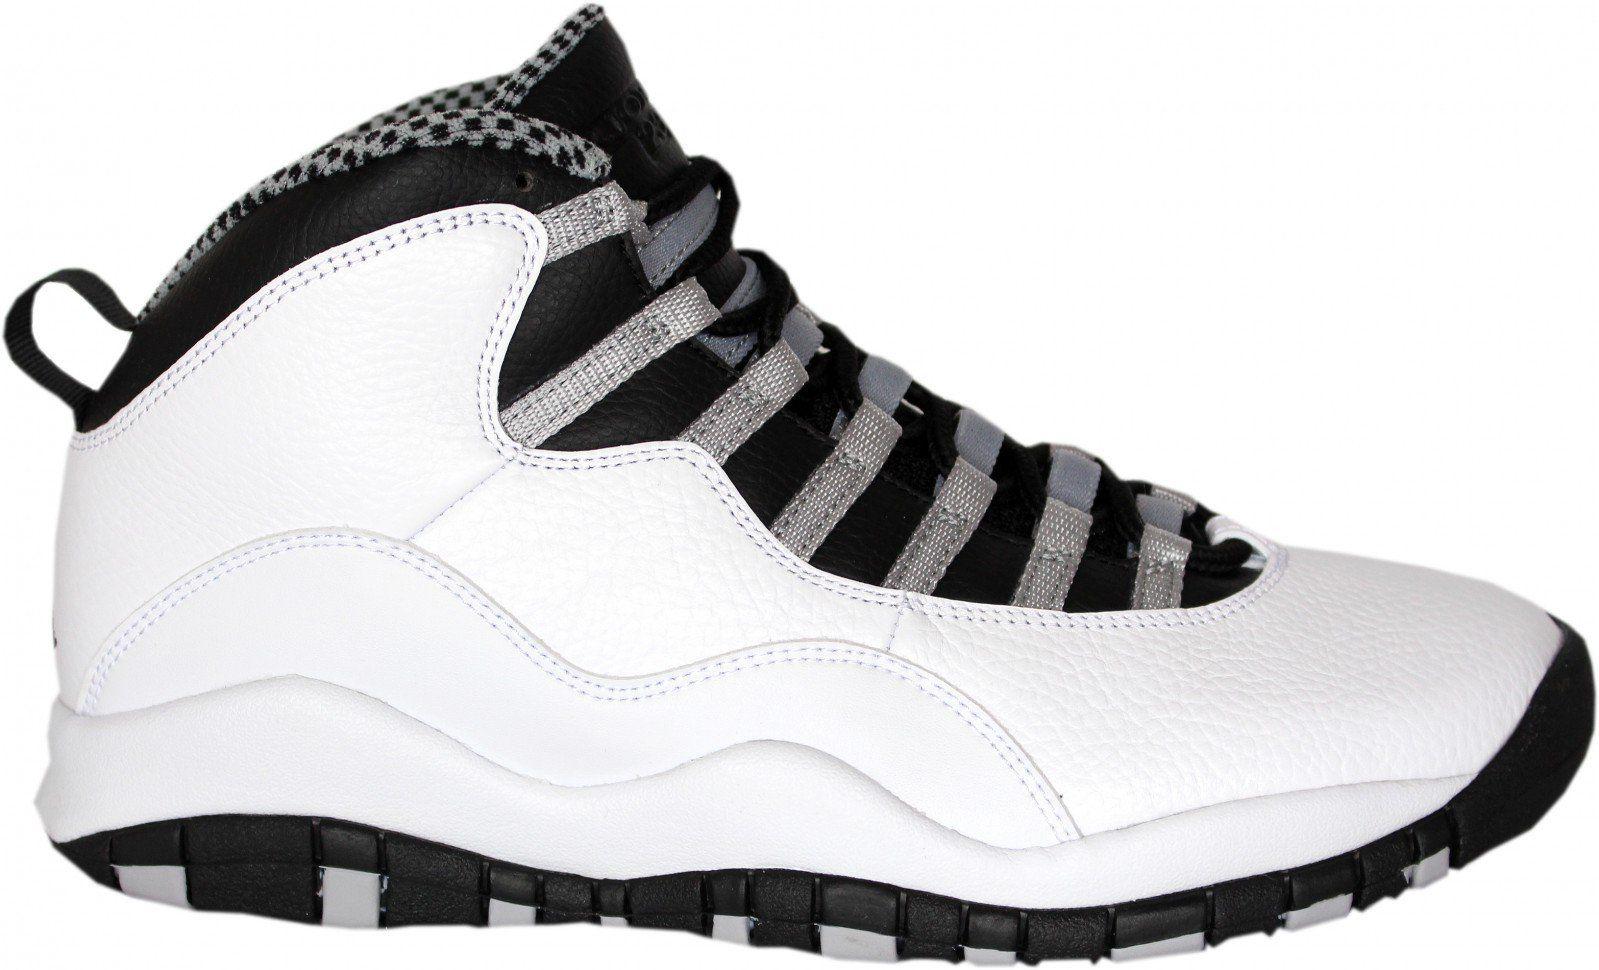 14d2d608795 Nike Mens Air Jordan Retro 10 Basketball Shoes White  Black Steel  Grey Varsity